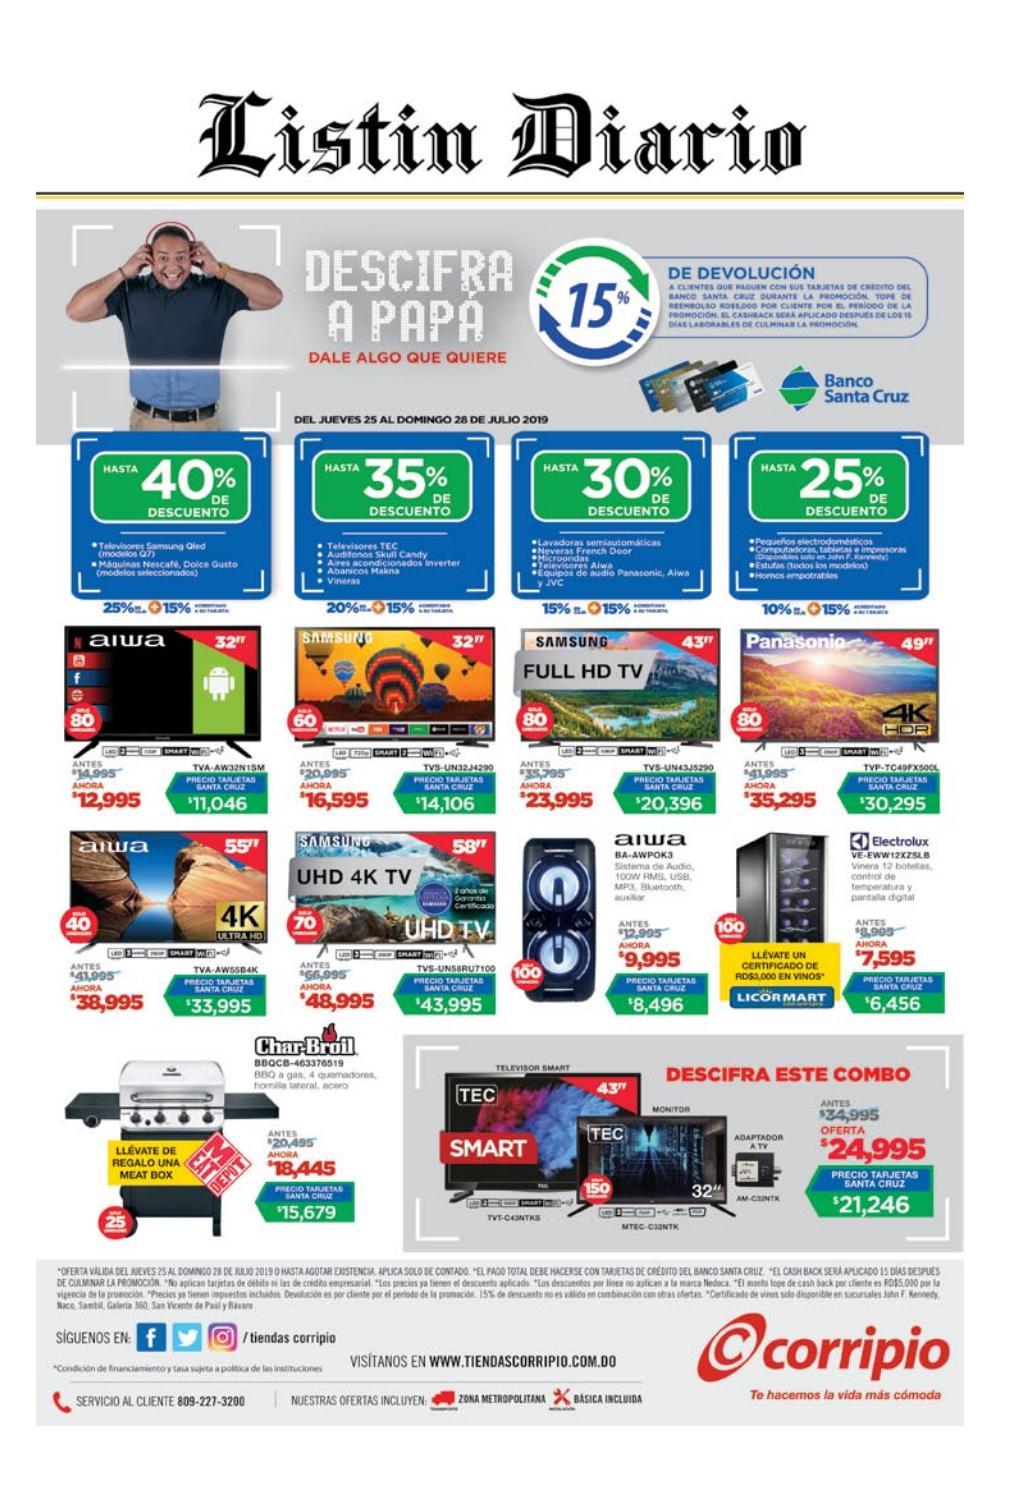 2bf2489b4439 LD 26-07-2019 by Listín Diario - issuu